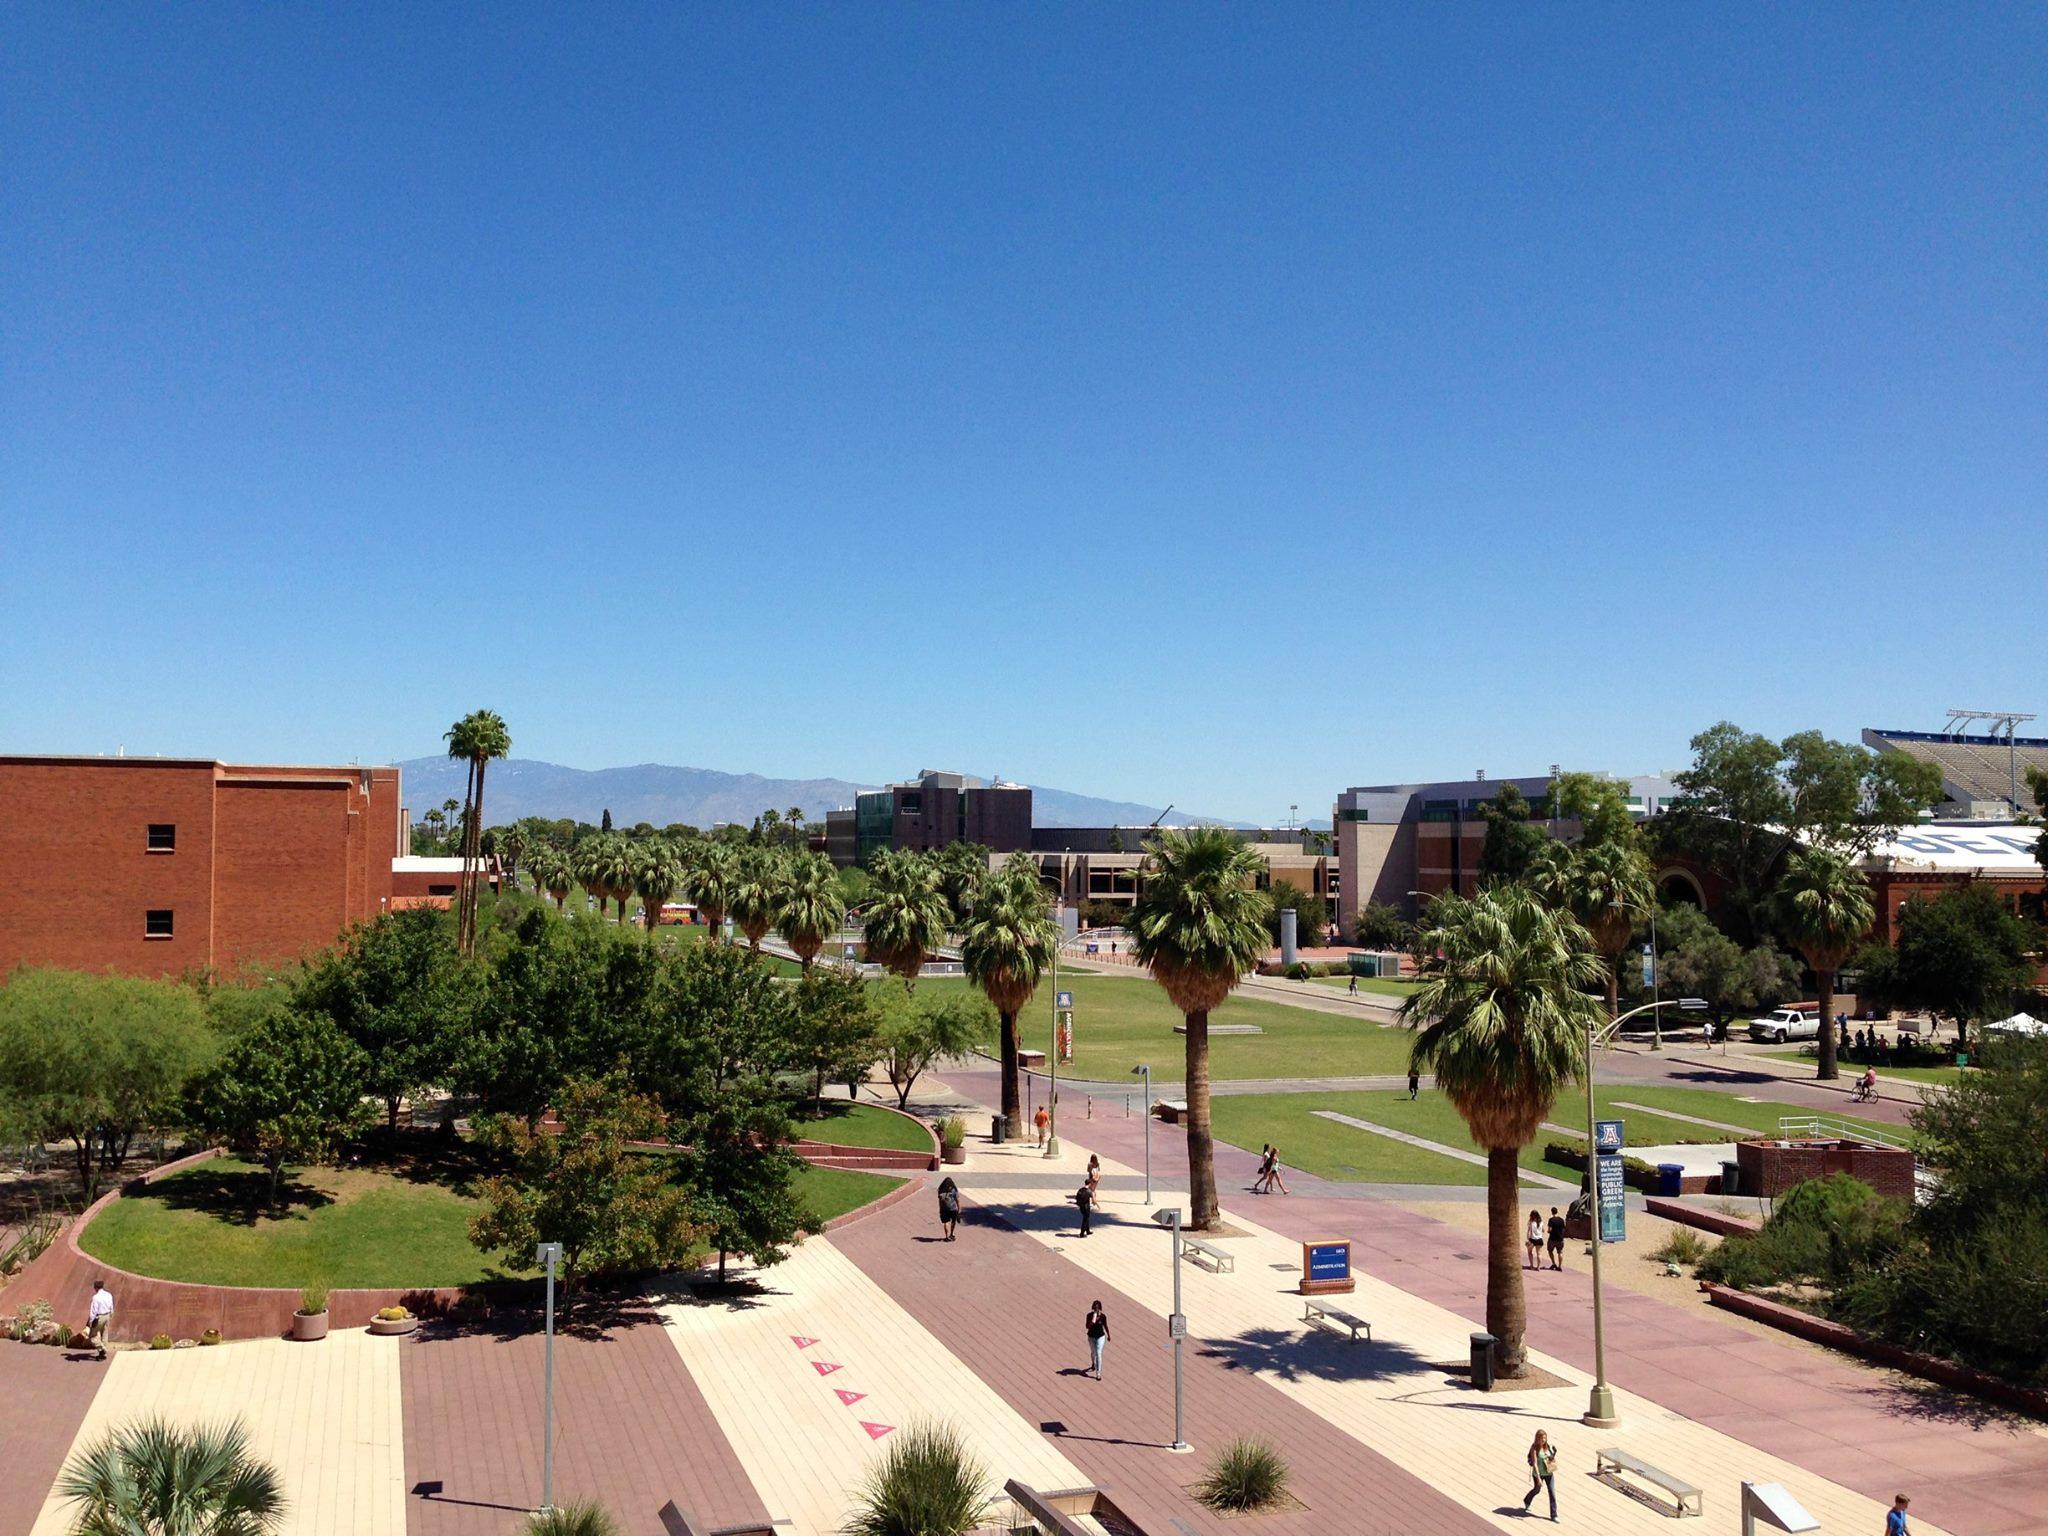 University of Arizona_SCHNEIDER, Rick.jpg